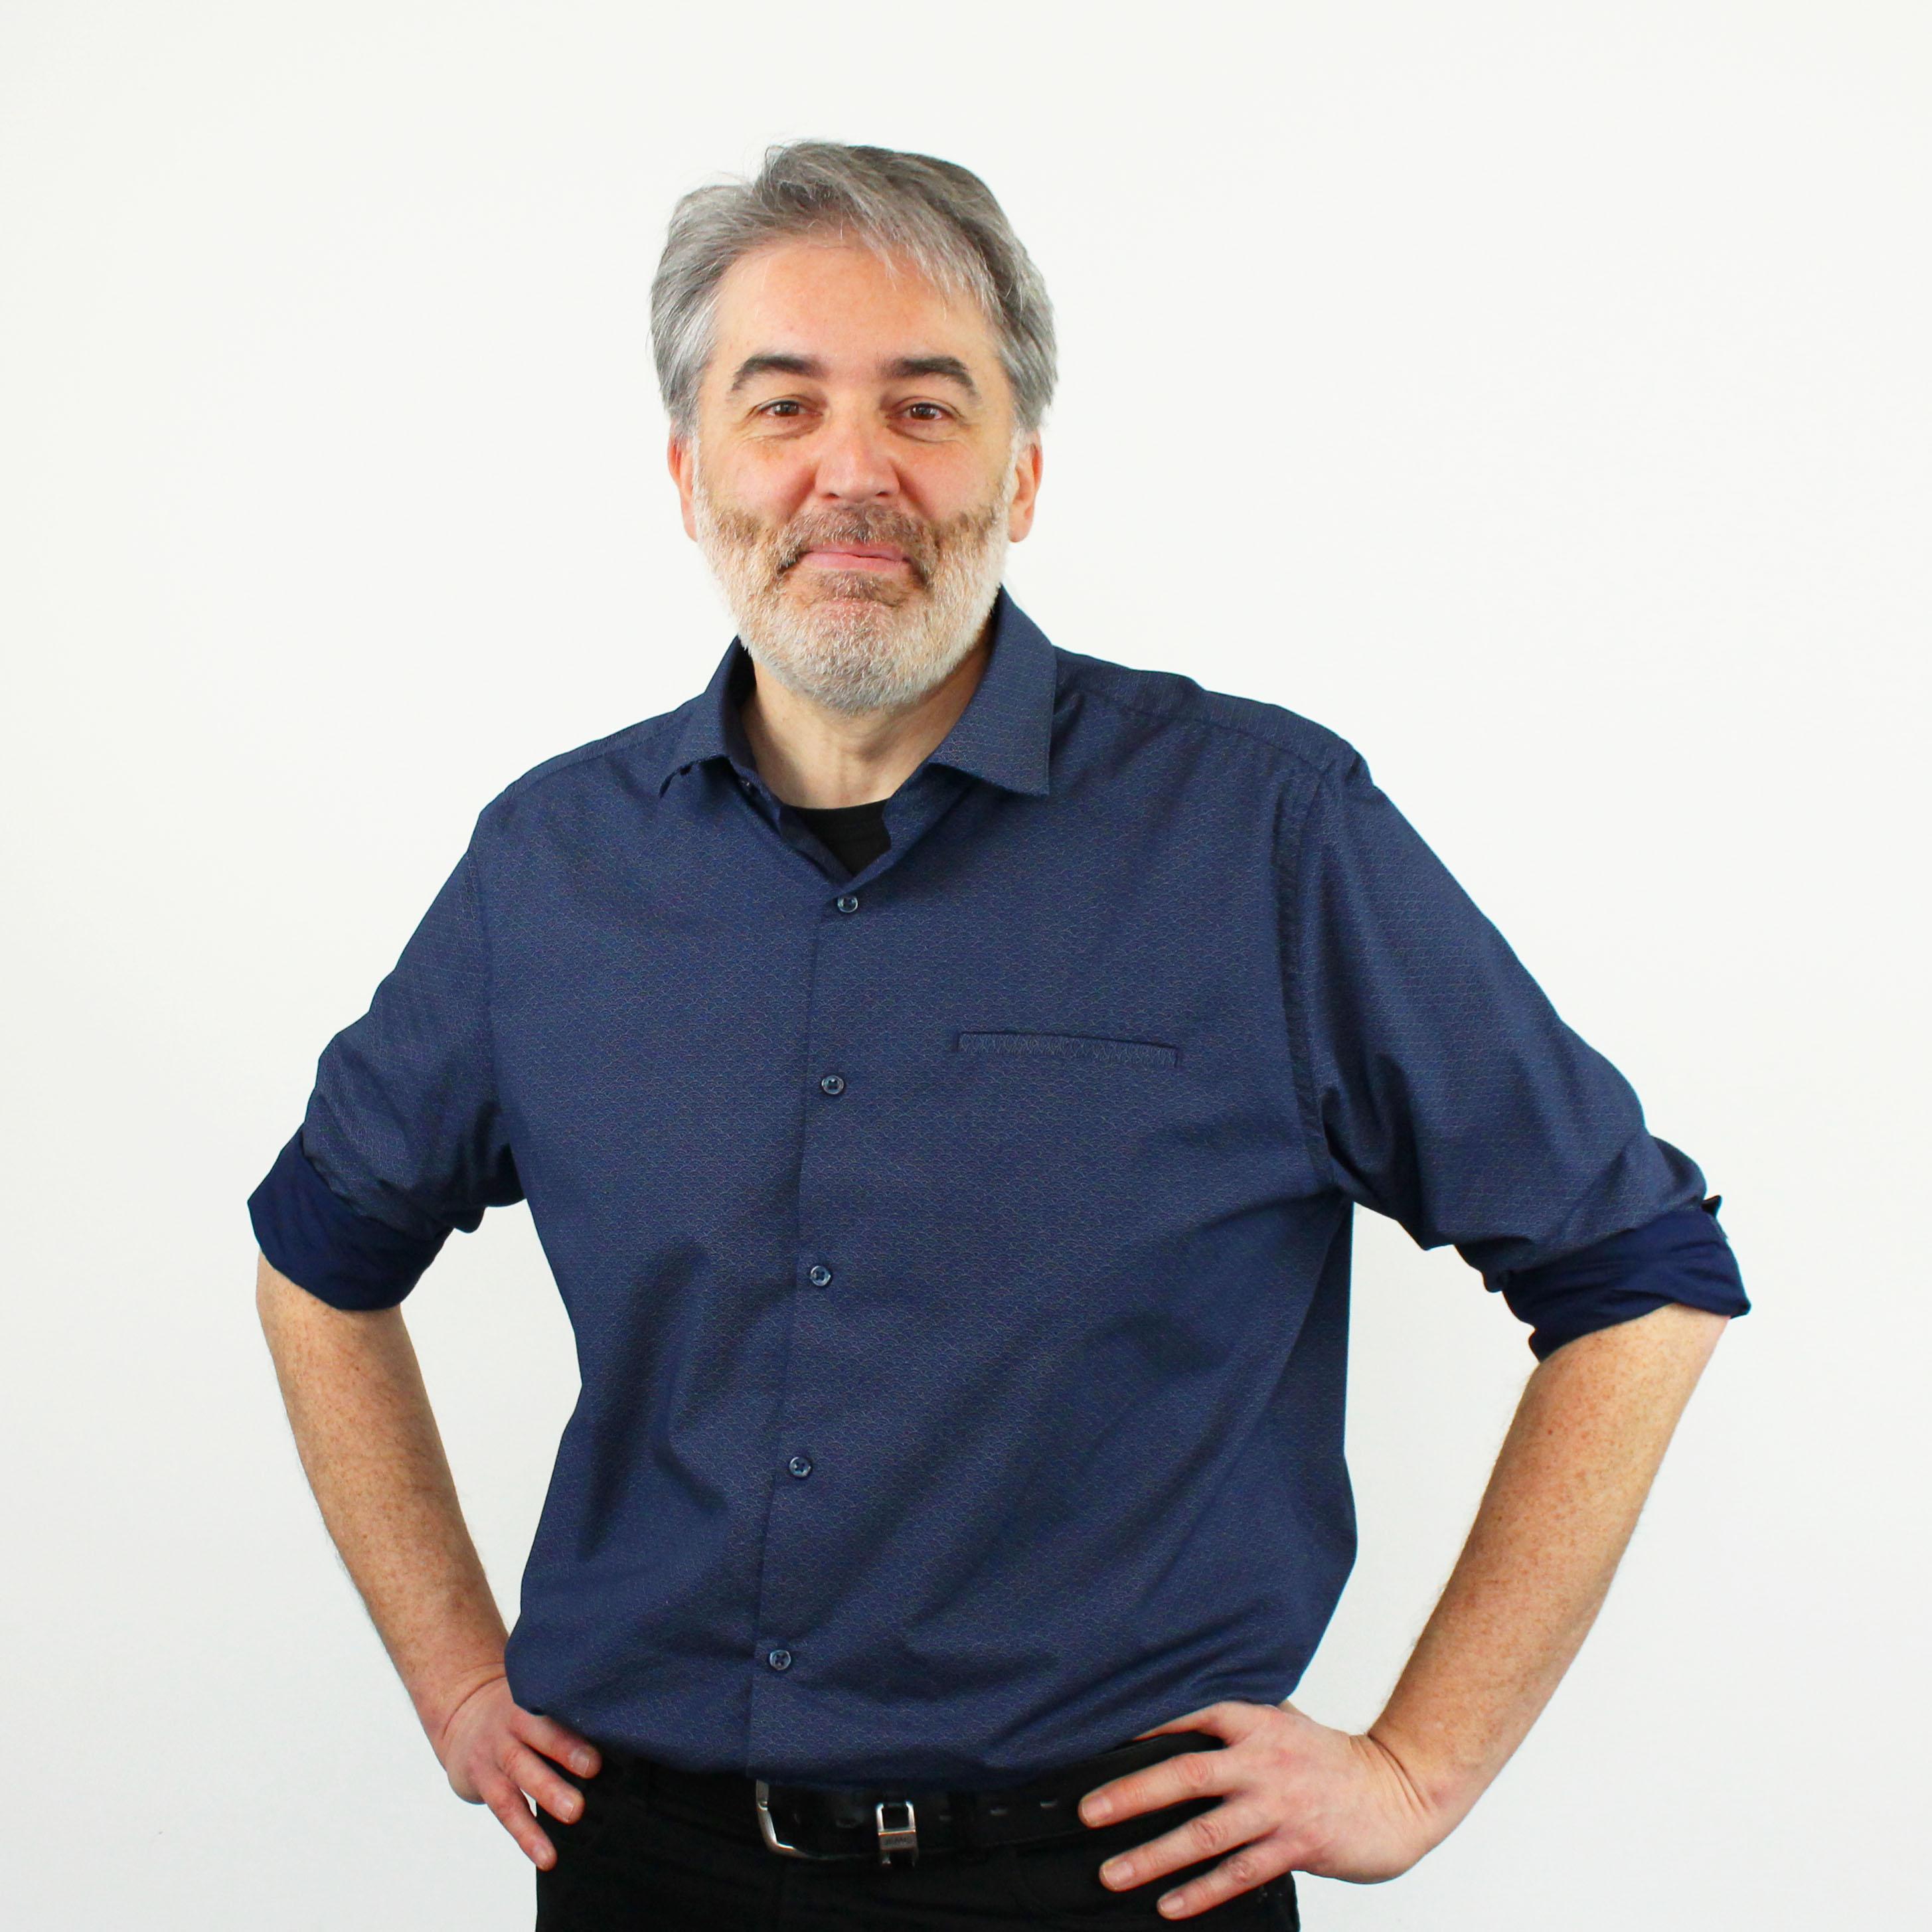 Christophe Guérinet